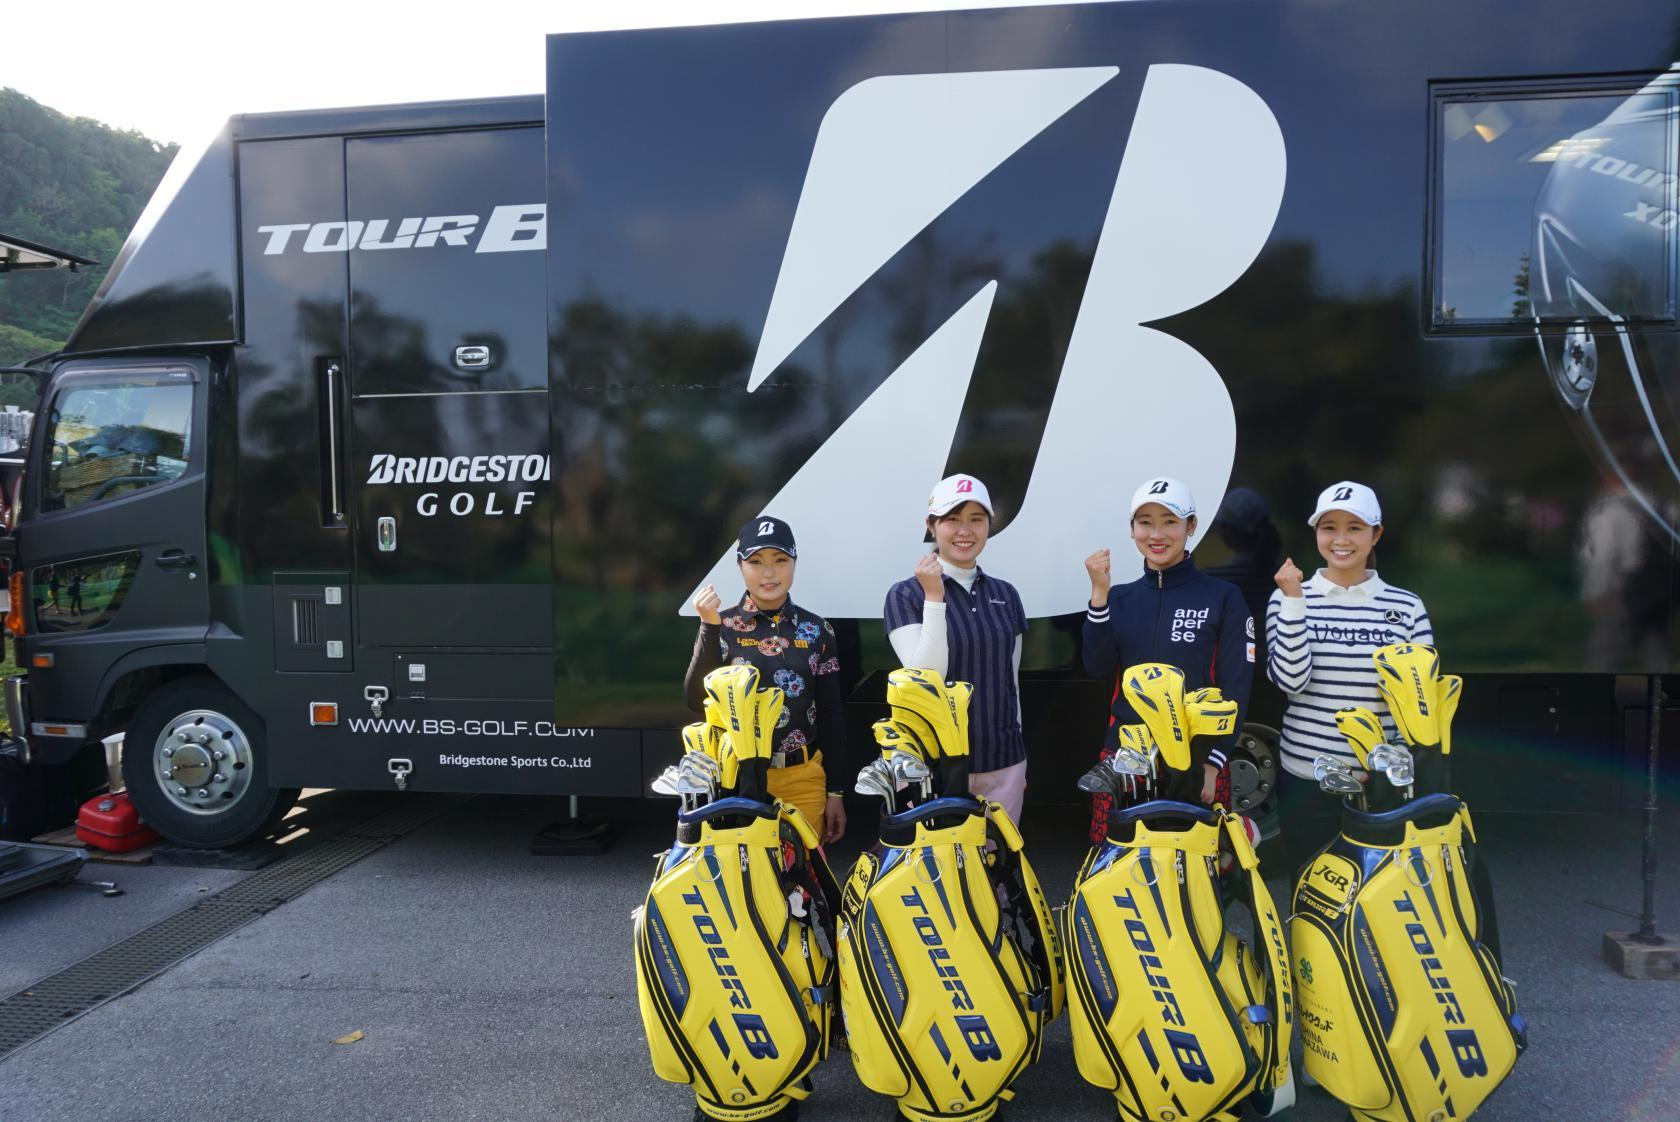 http://www.bs-golf.com/pro/5.IMG_2692.JPG